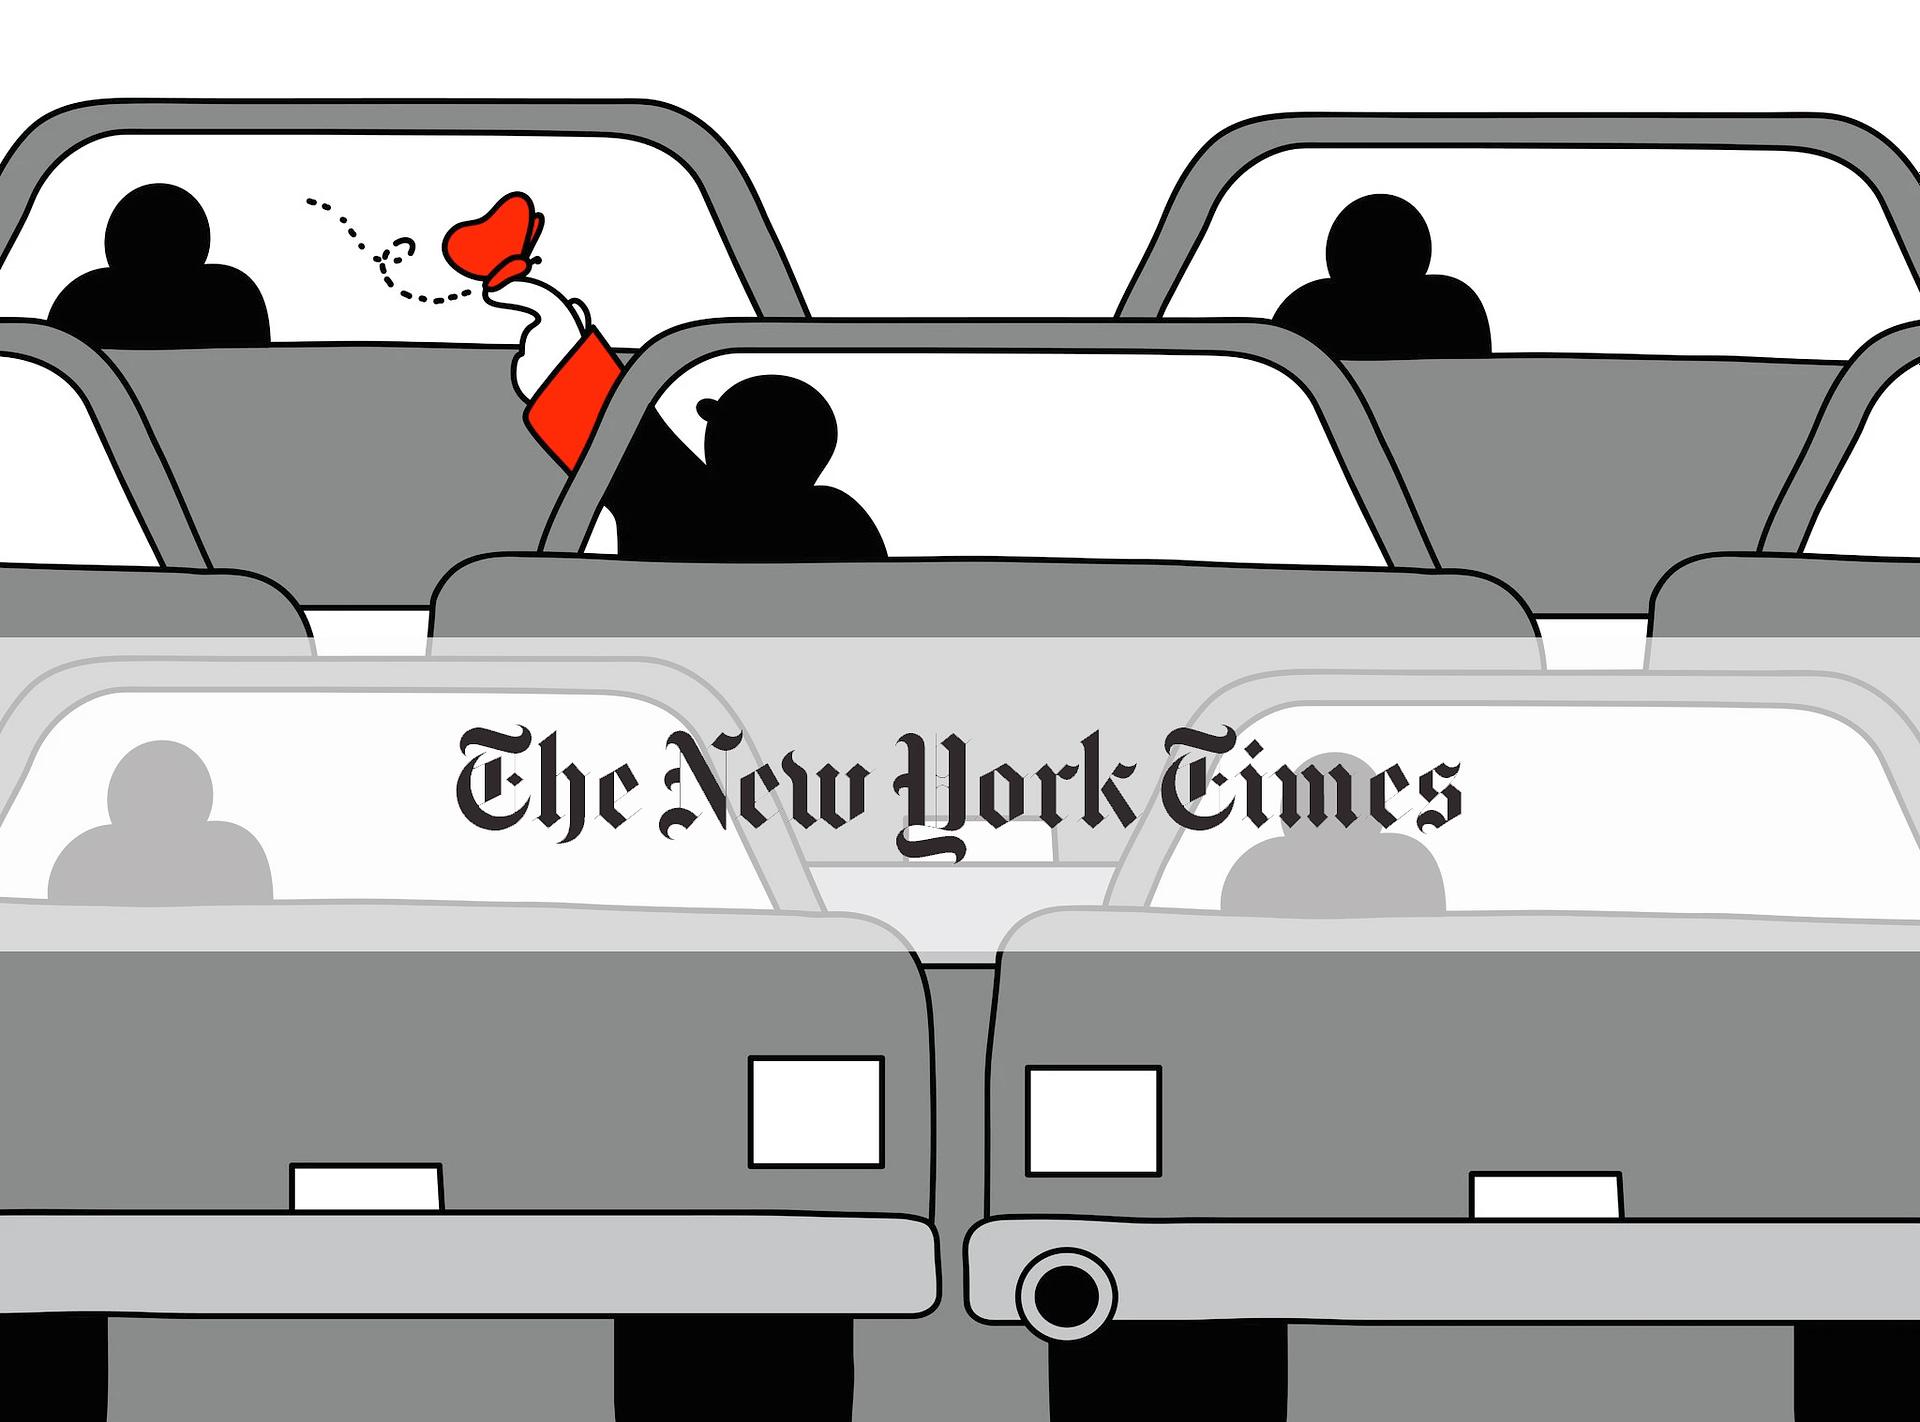 New York Times: Forgiving Enemies